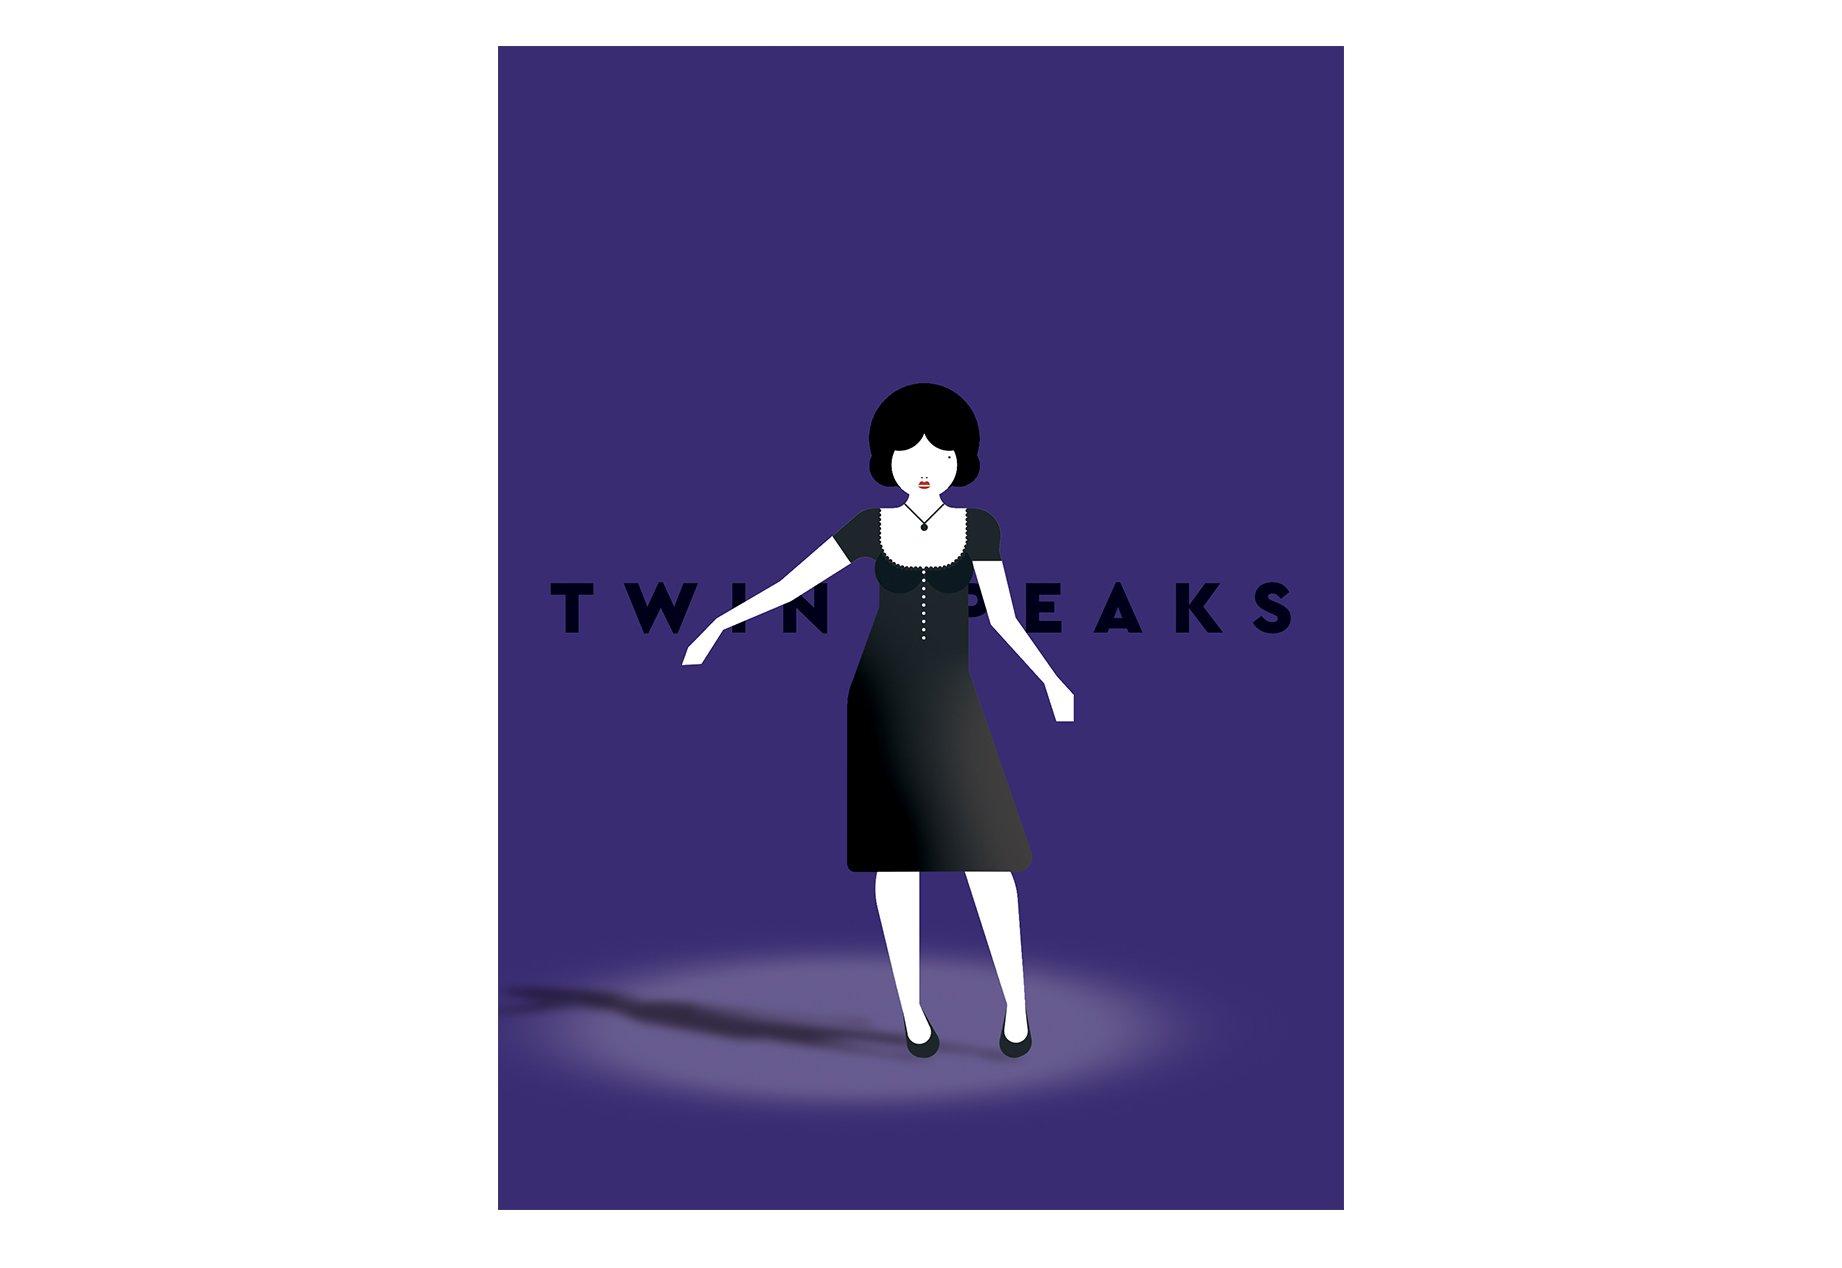 twin-peaks-3-poster-illustration-alice-iuri